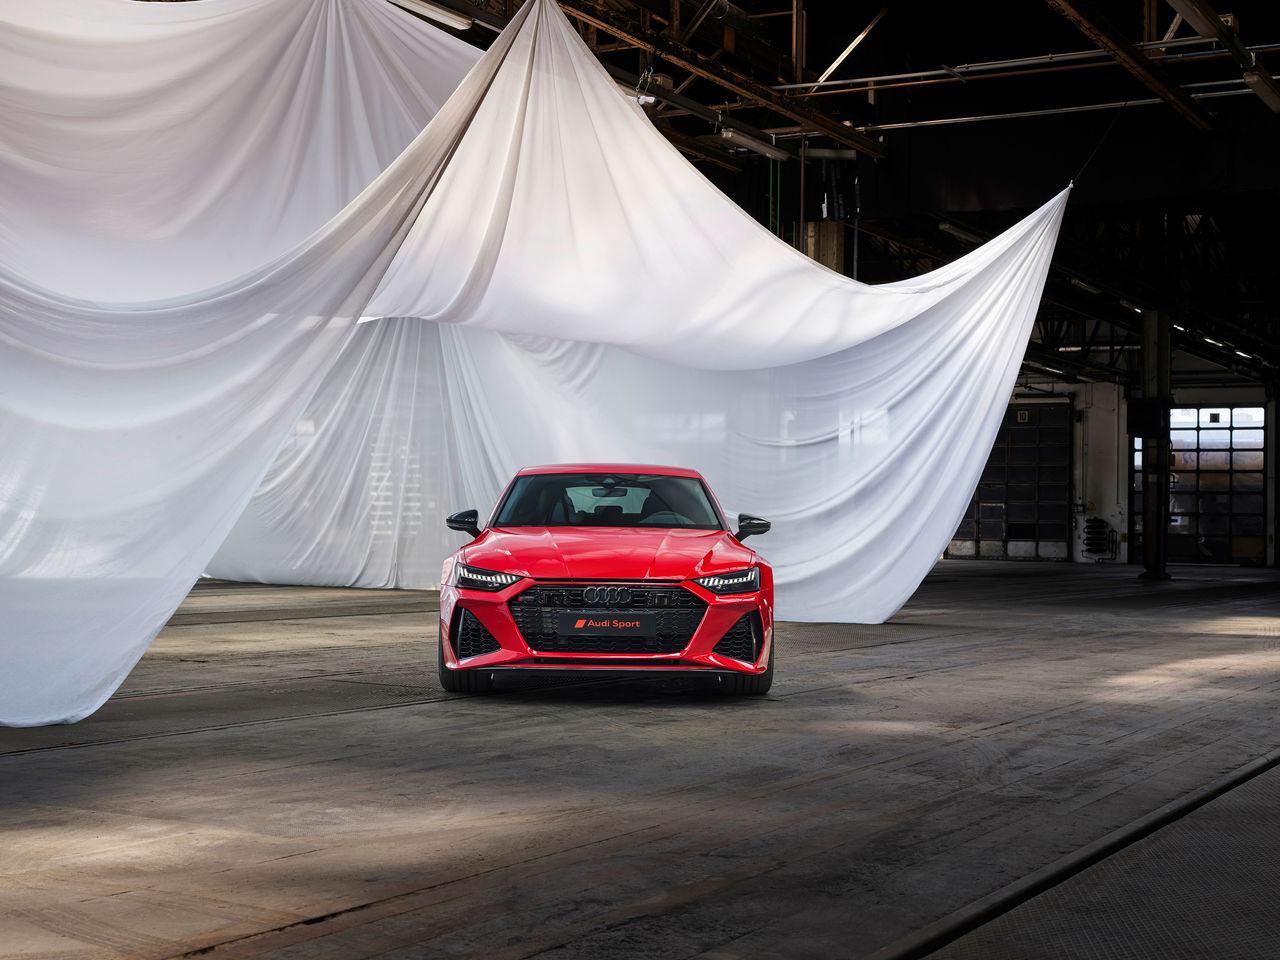 Audi Sport Erlebnistag im Audi Forum Neckarsulm | Audi ... | audi car sport